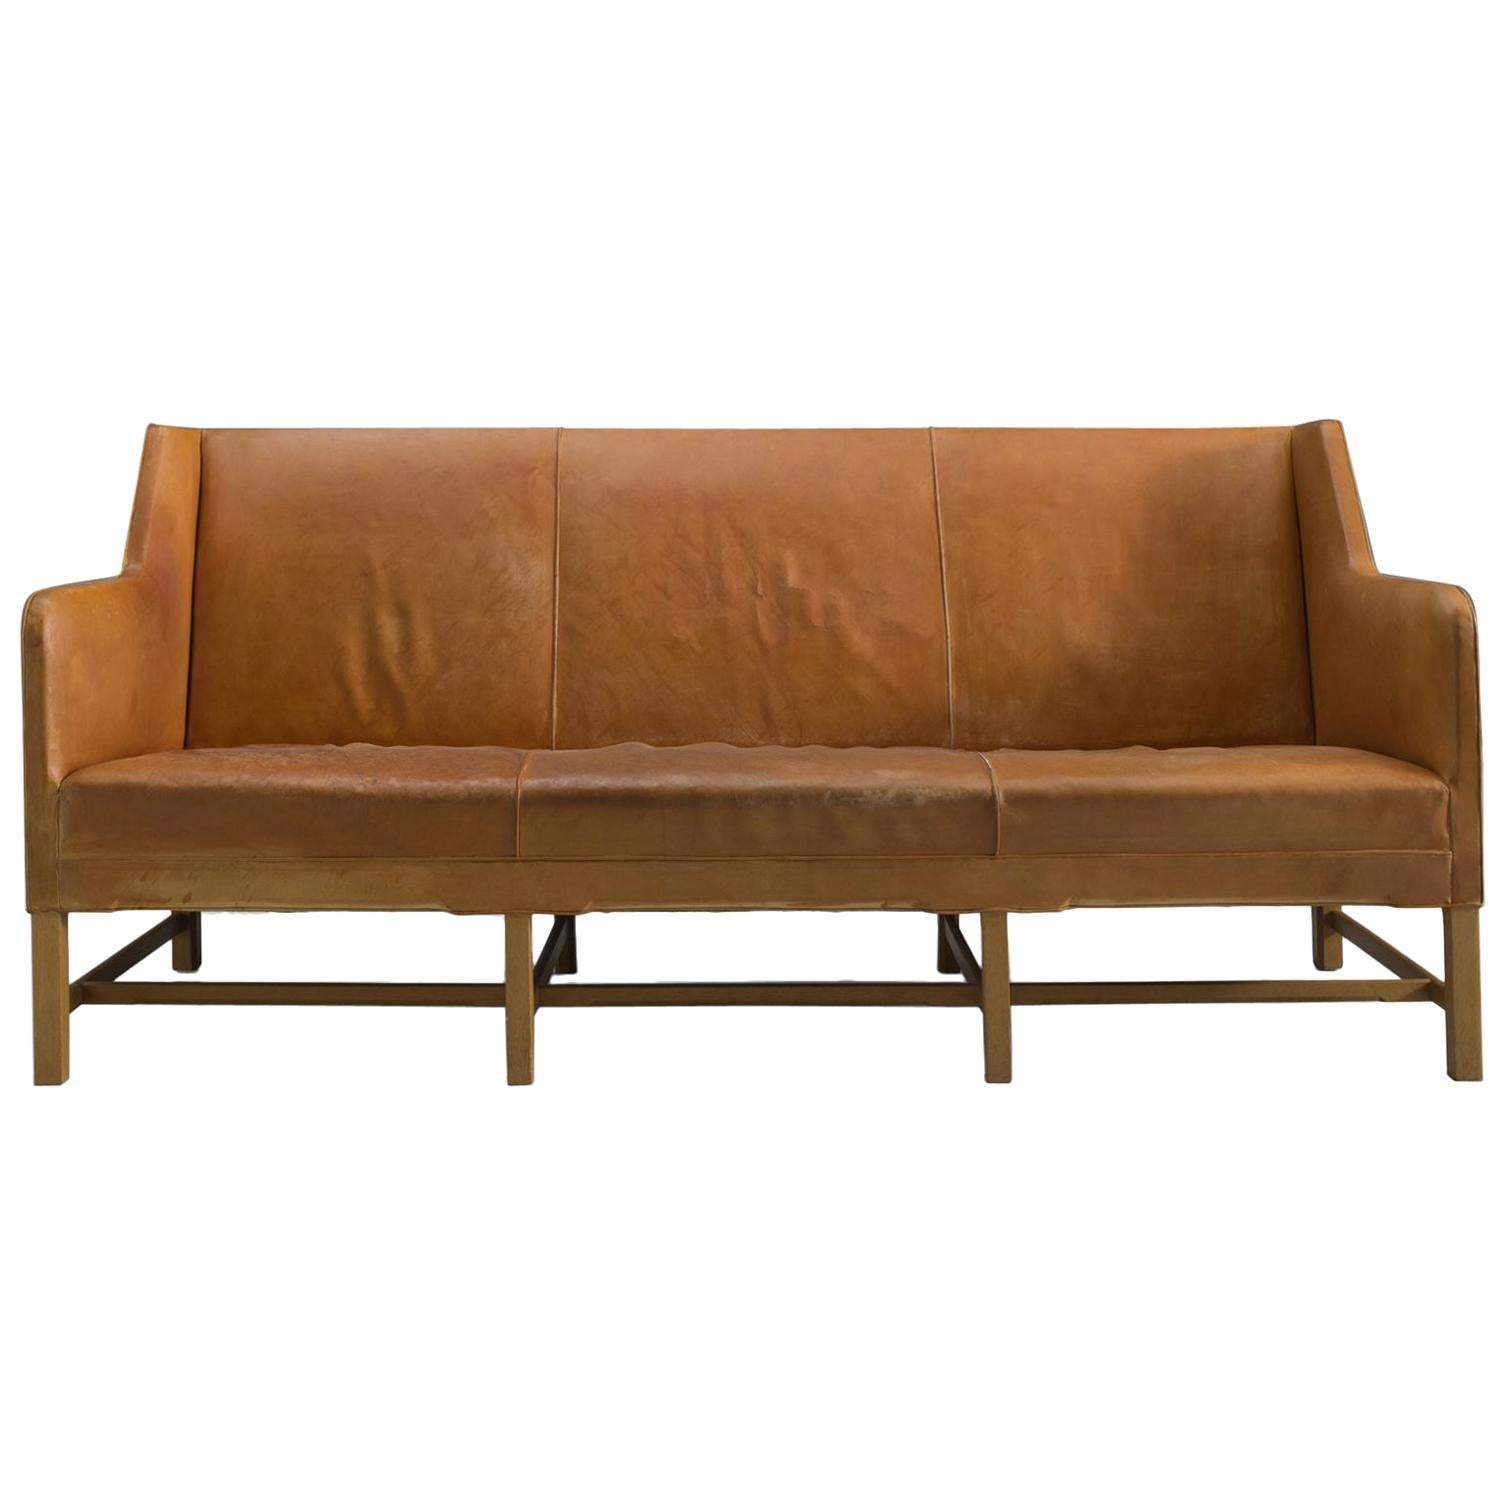 Kaare Klint Sofa in Oak and Original Cognac Leather